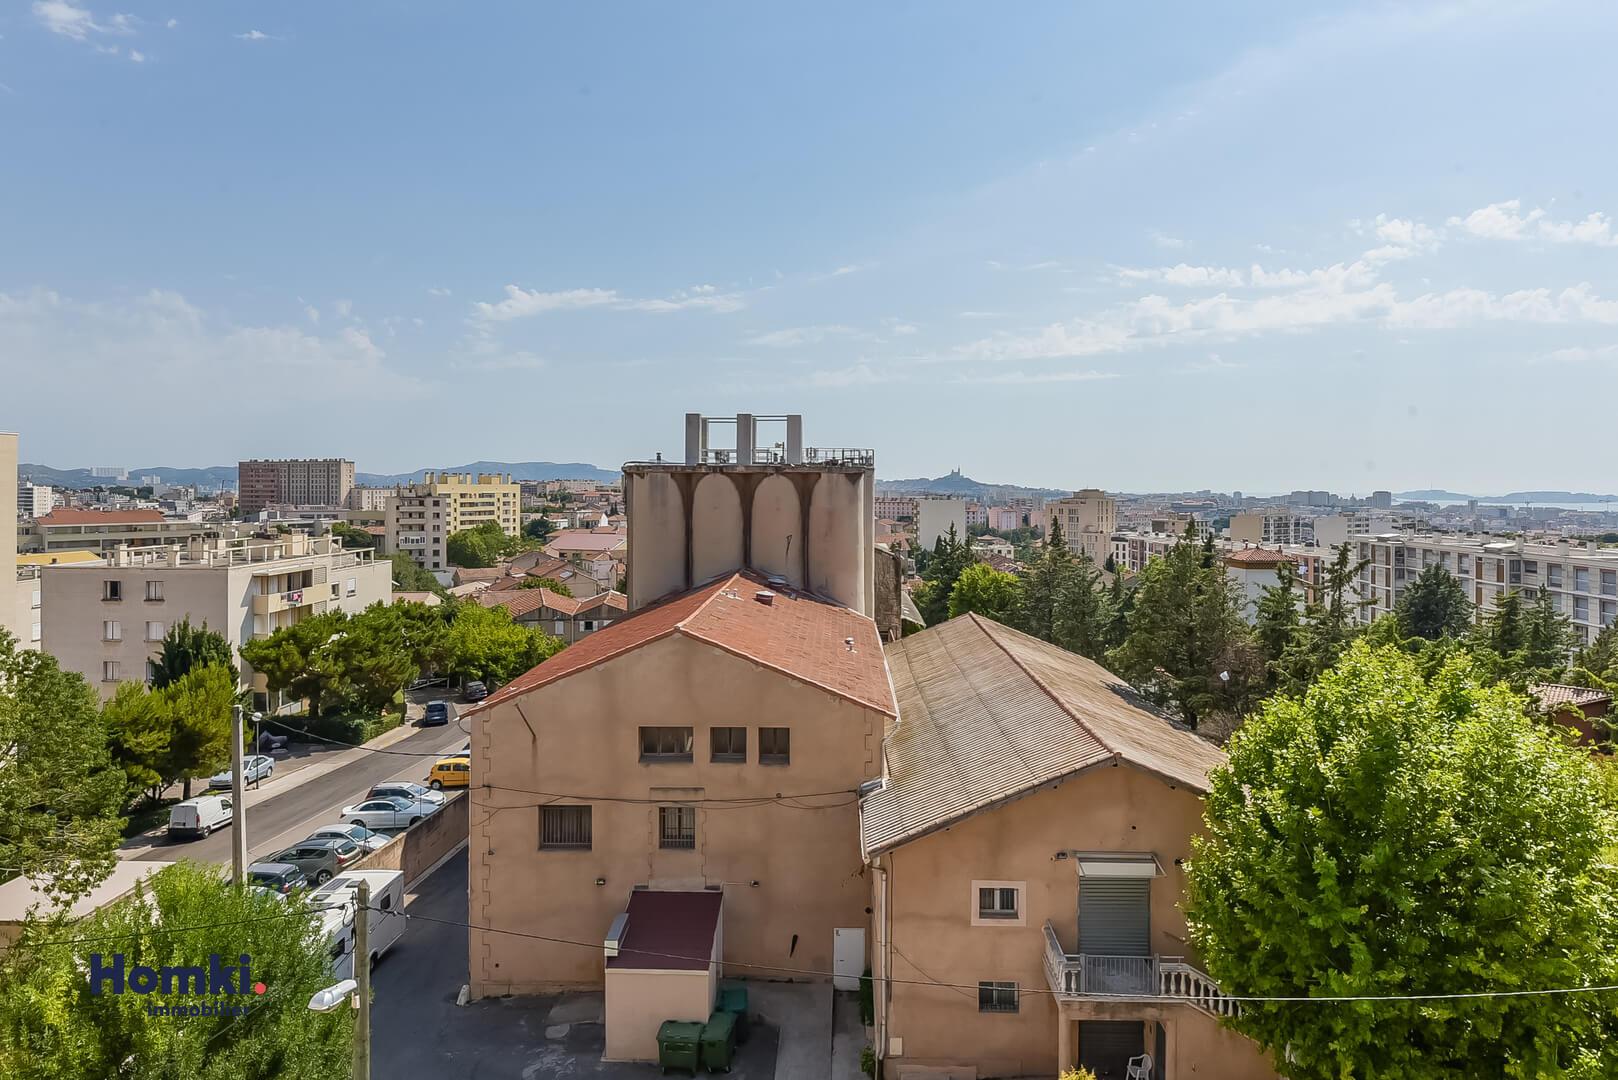 Vente loft Marseille T3 13013 130m²_11